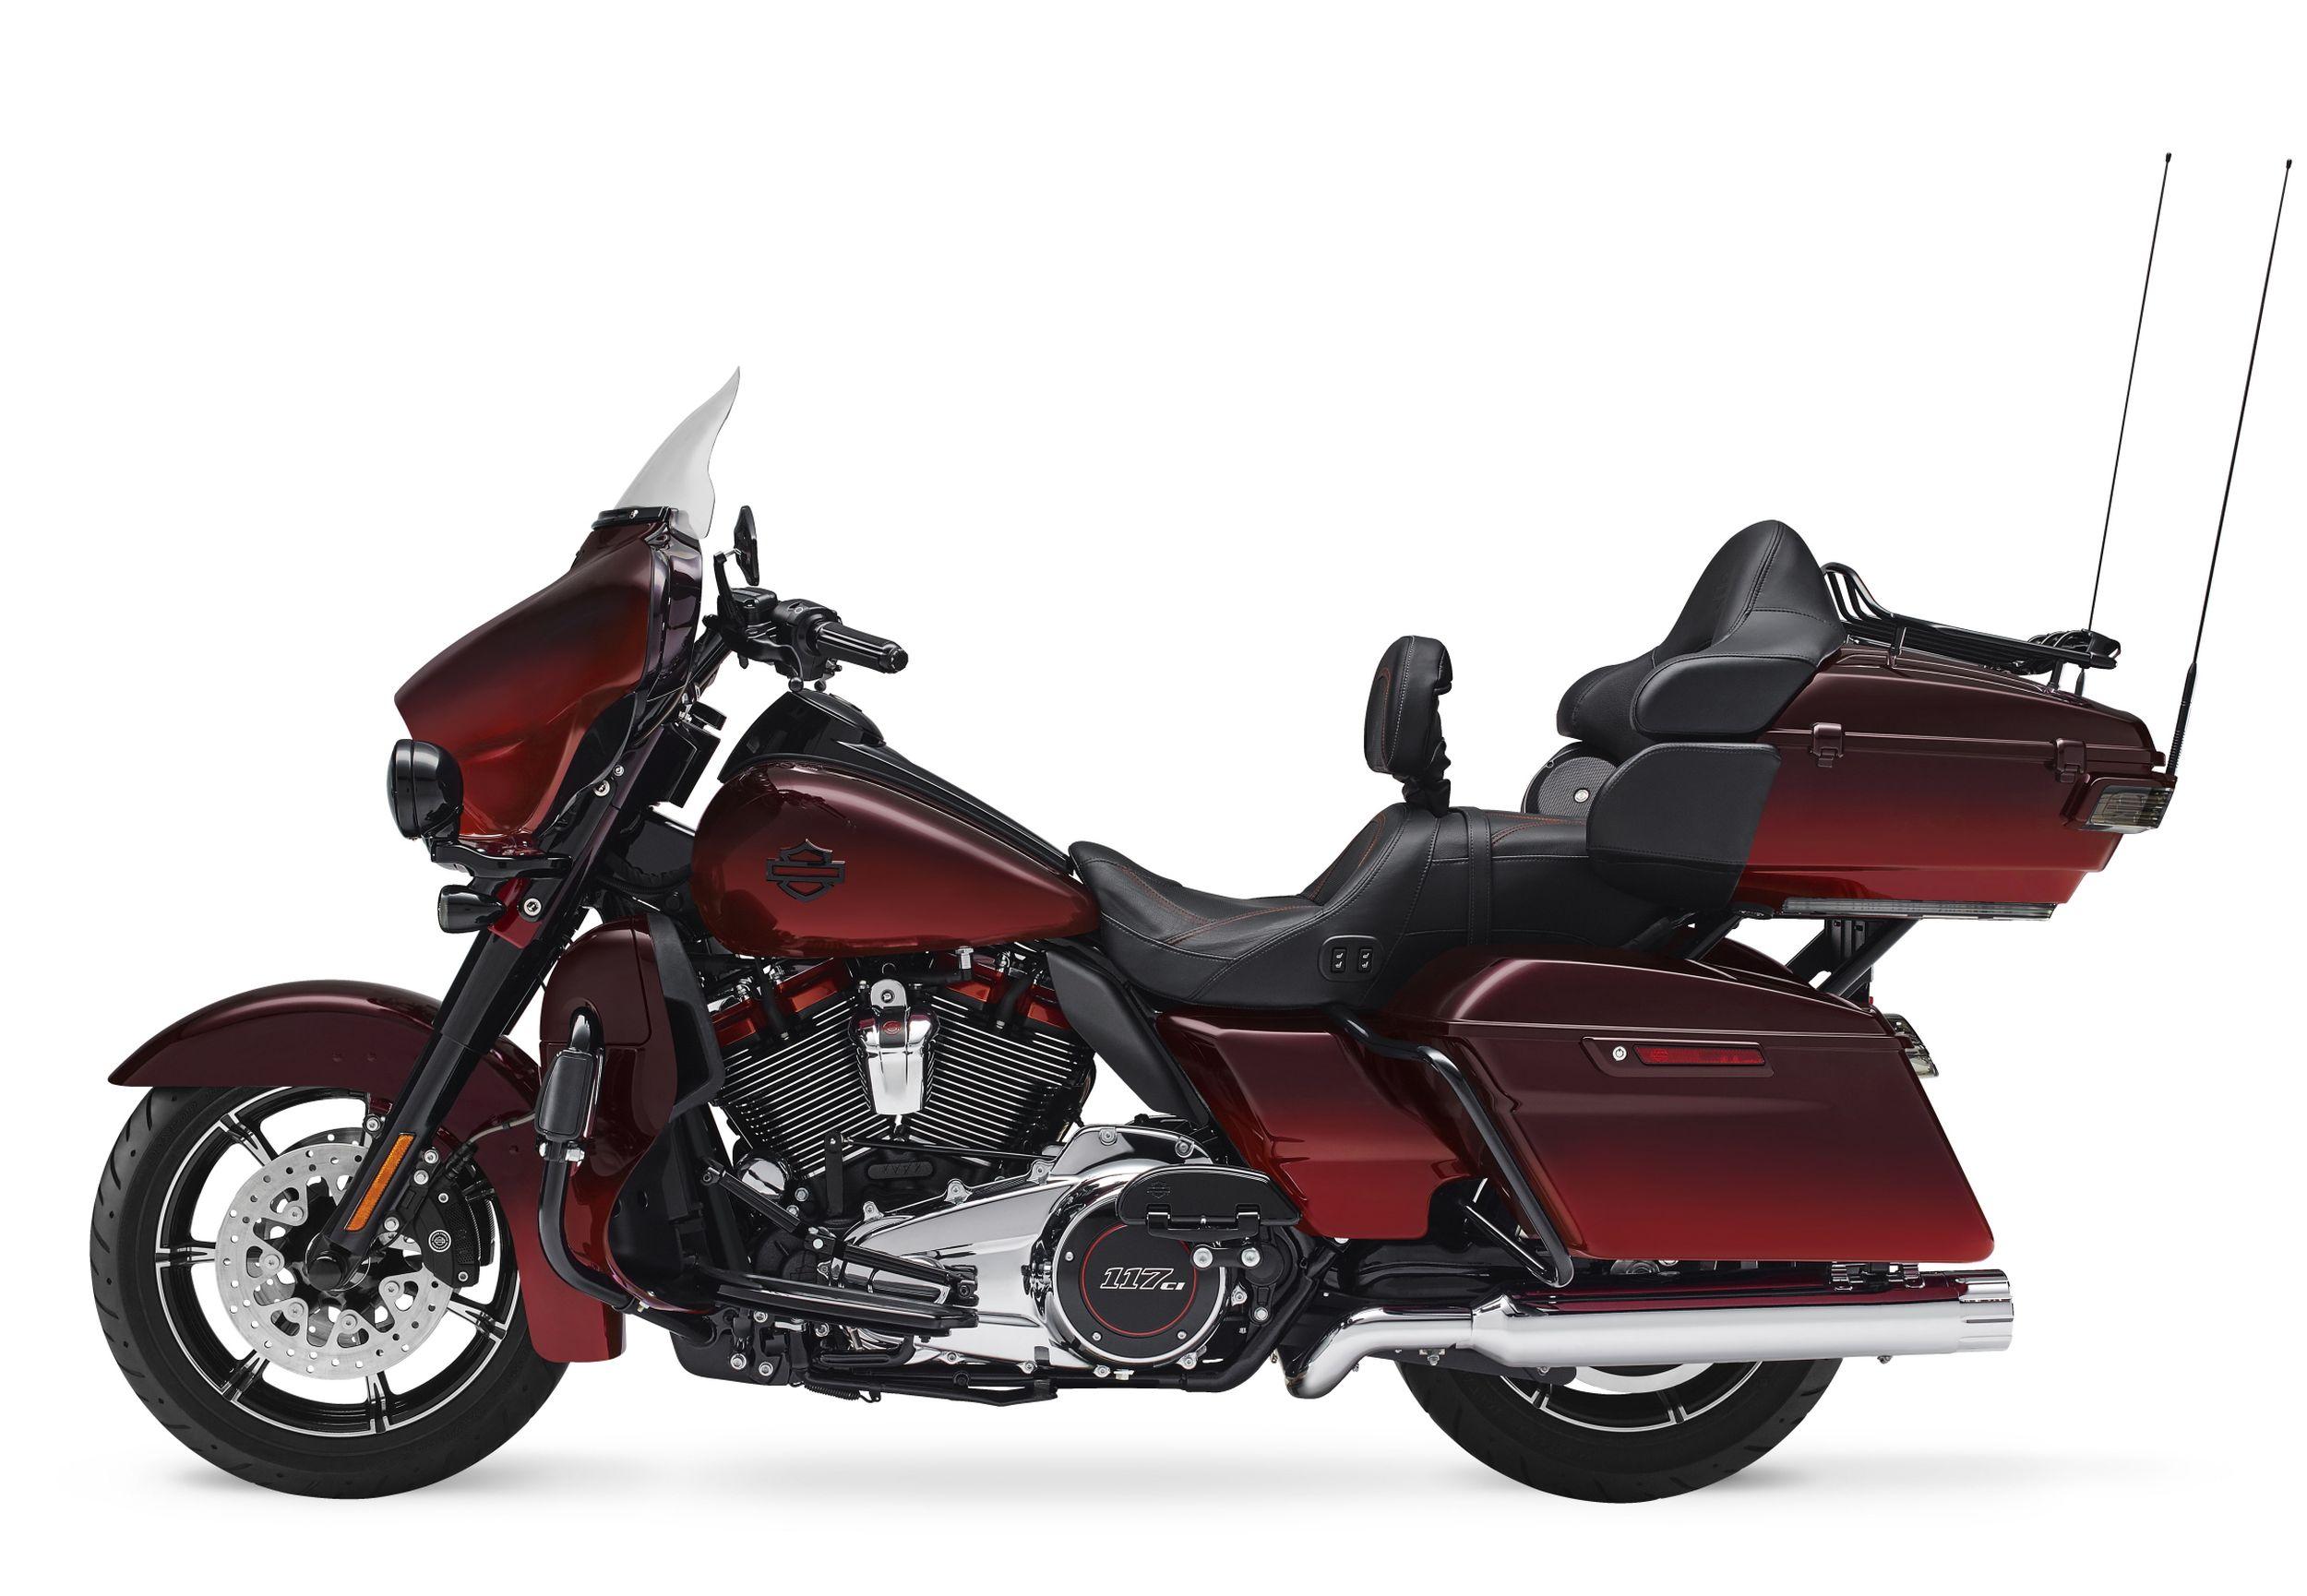 Harley Davidson Flhtkse Cvo Limited